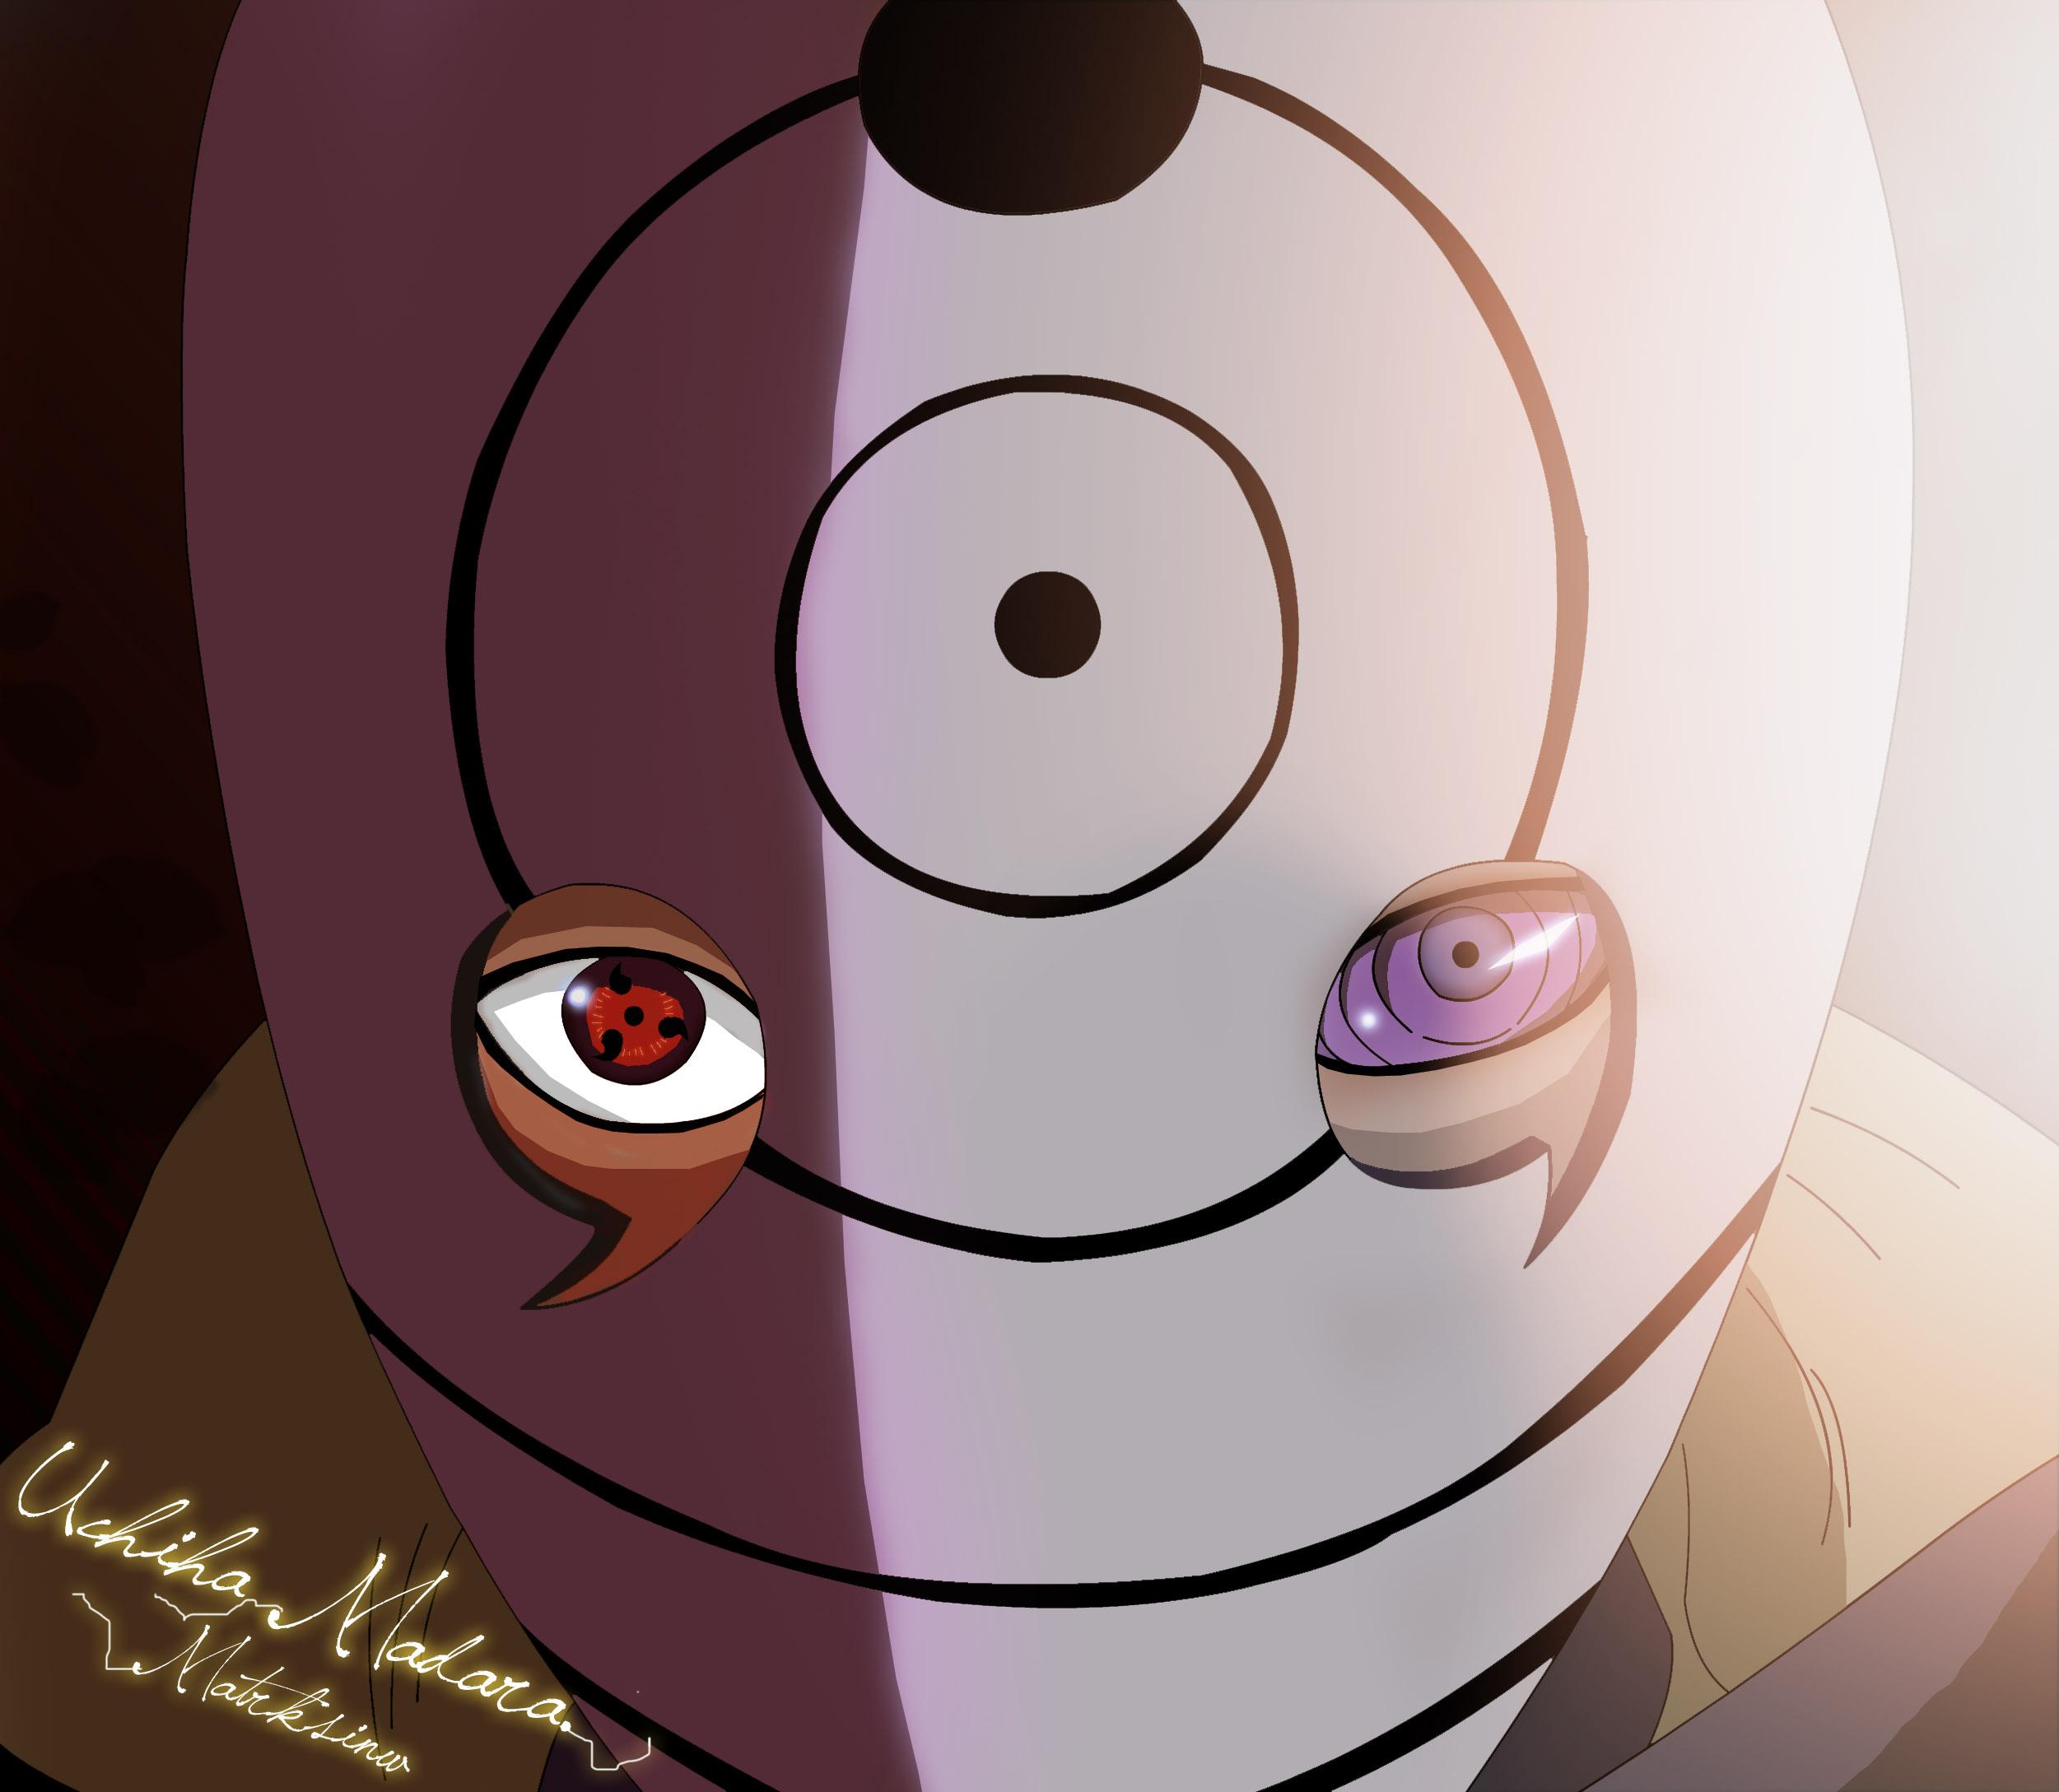 Tobi Uchiha Madara New Mask by matrksinw on DeviantArt